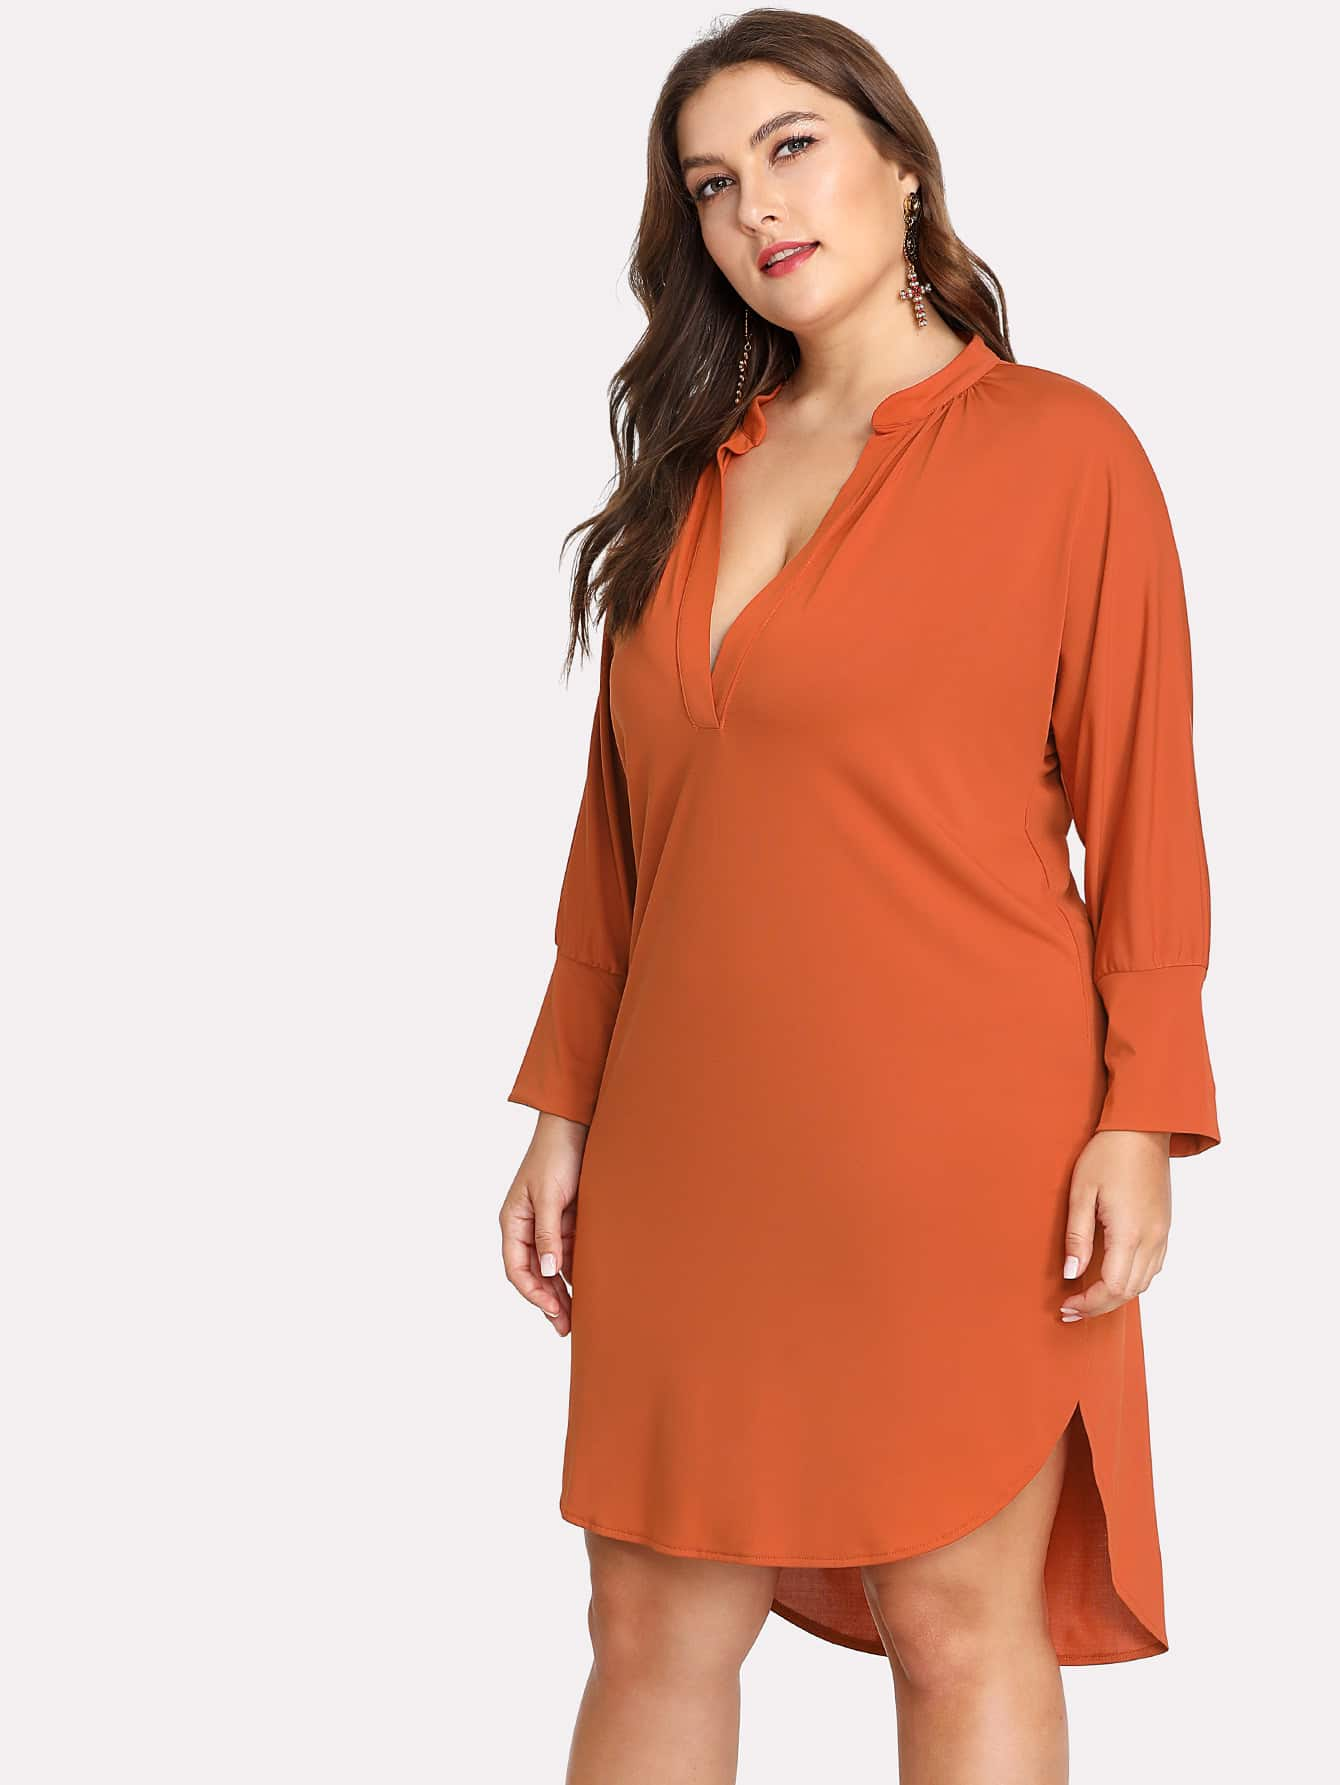 V Cut Neck High Low Tunic Dress floral v neck high low dress